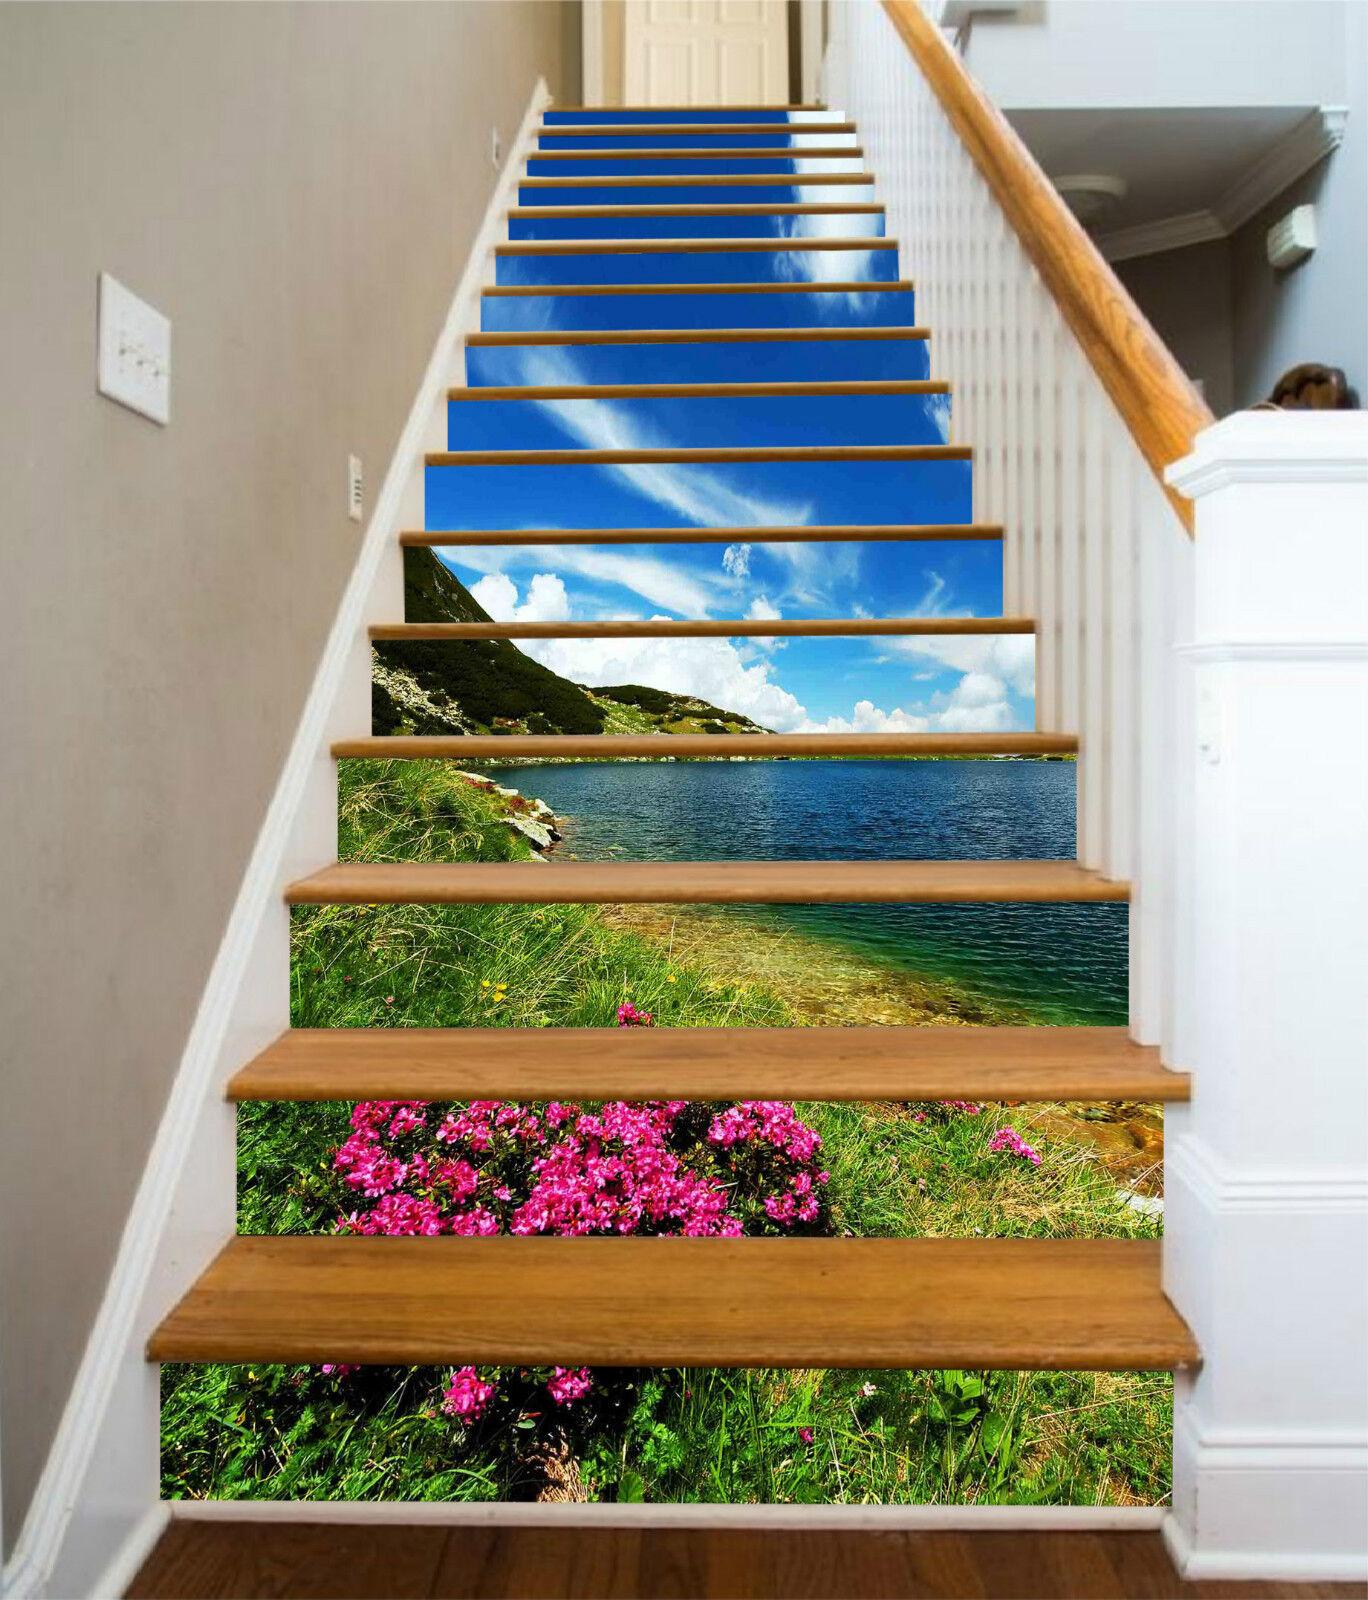 3D Schöner See 315 Stair Risers Dekoration Fototapete Vinyl Aufkleber Tapete DE